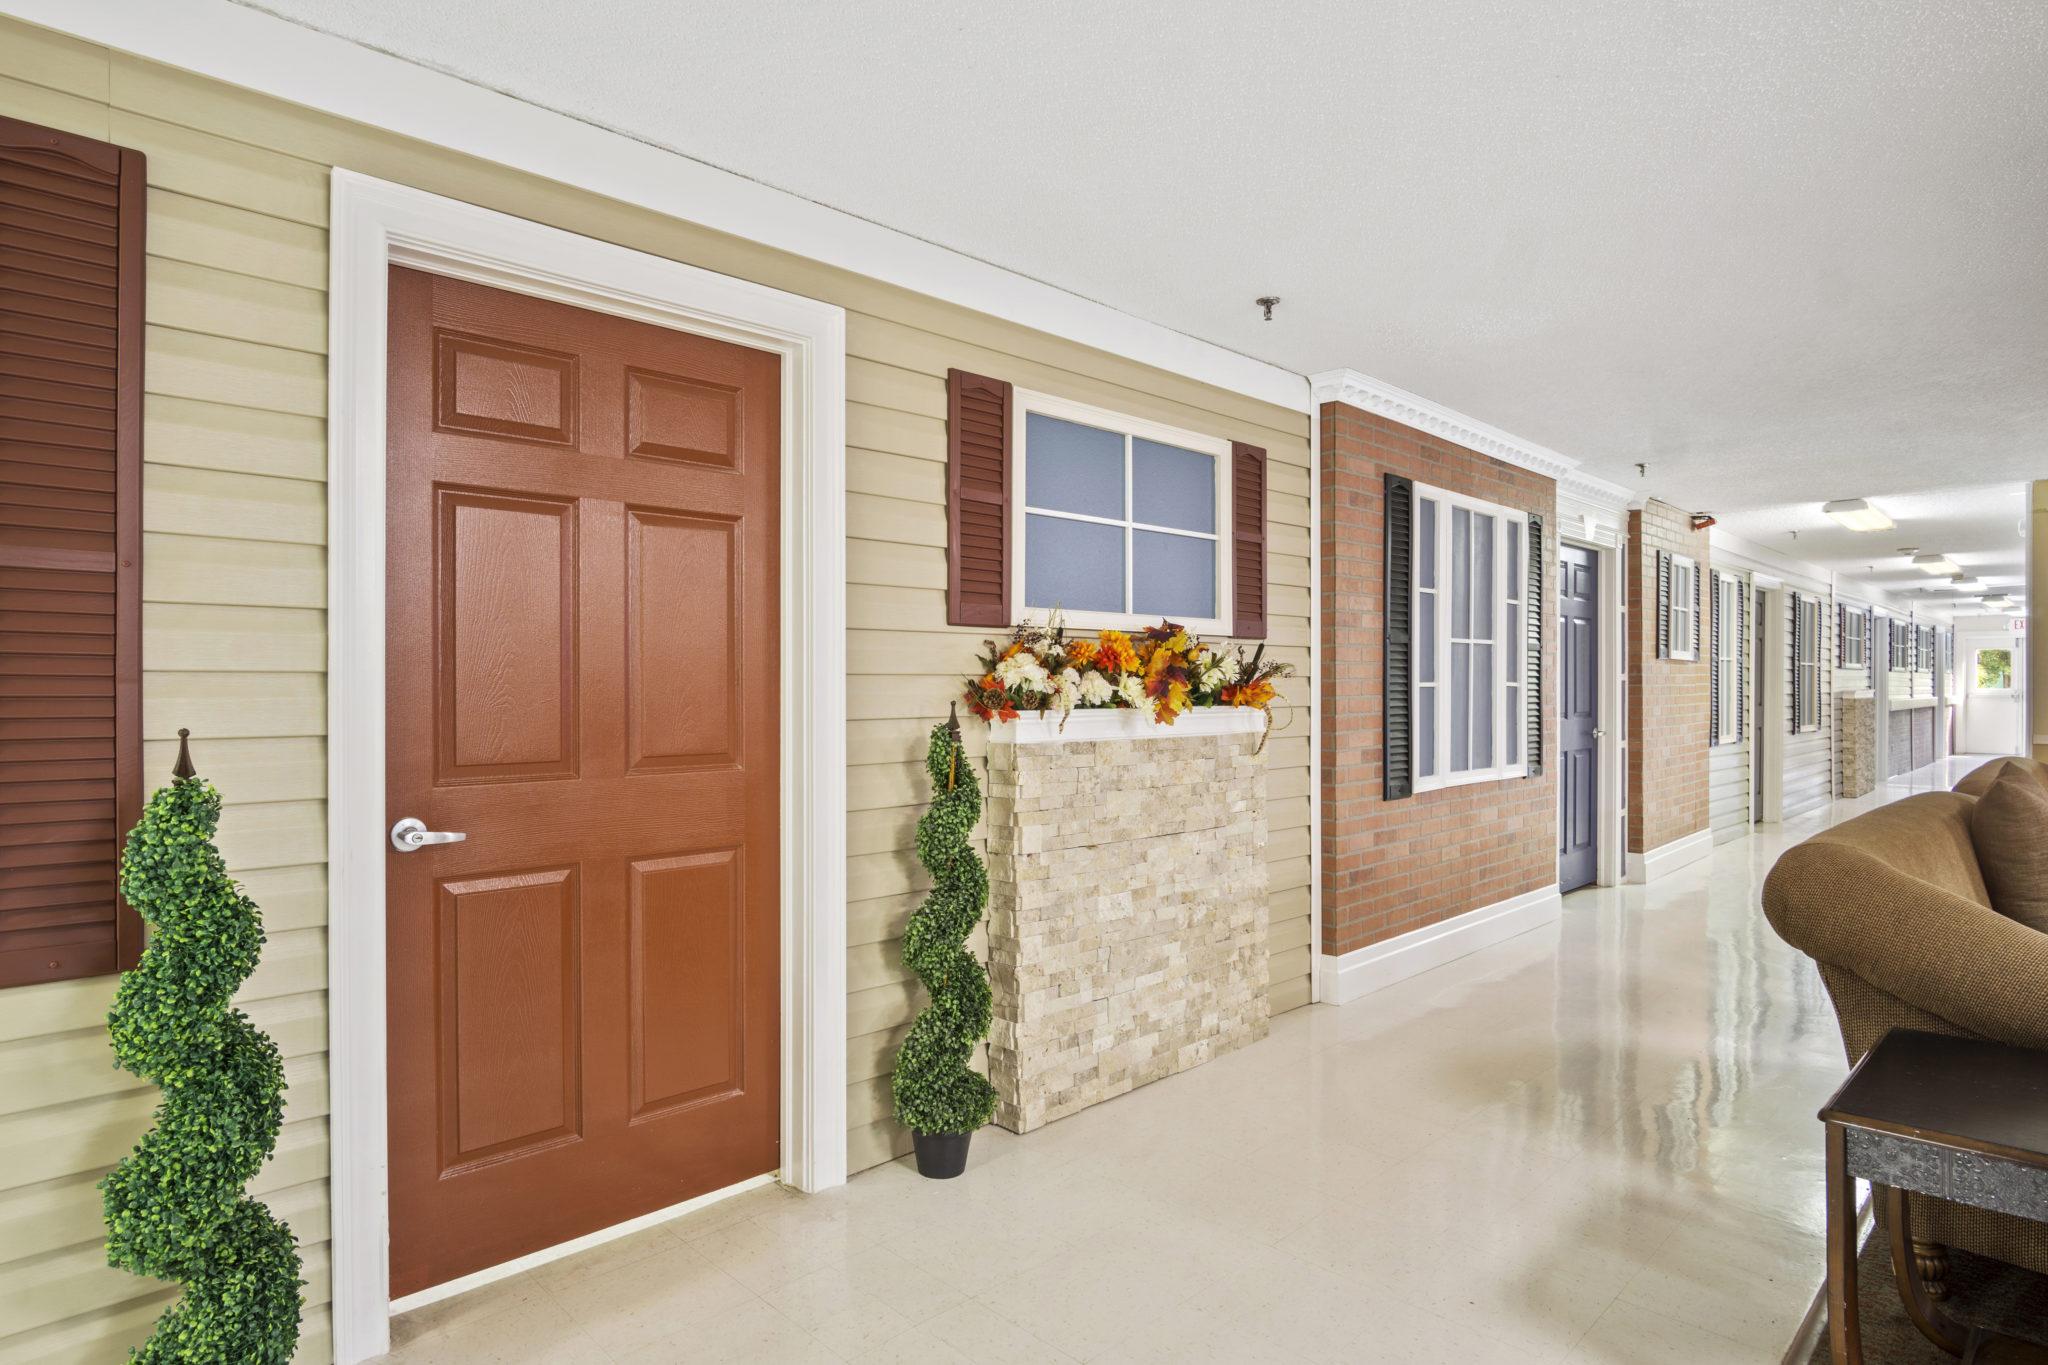 Hallway with doors and windows